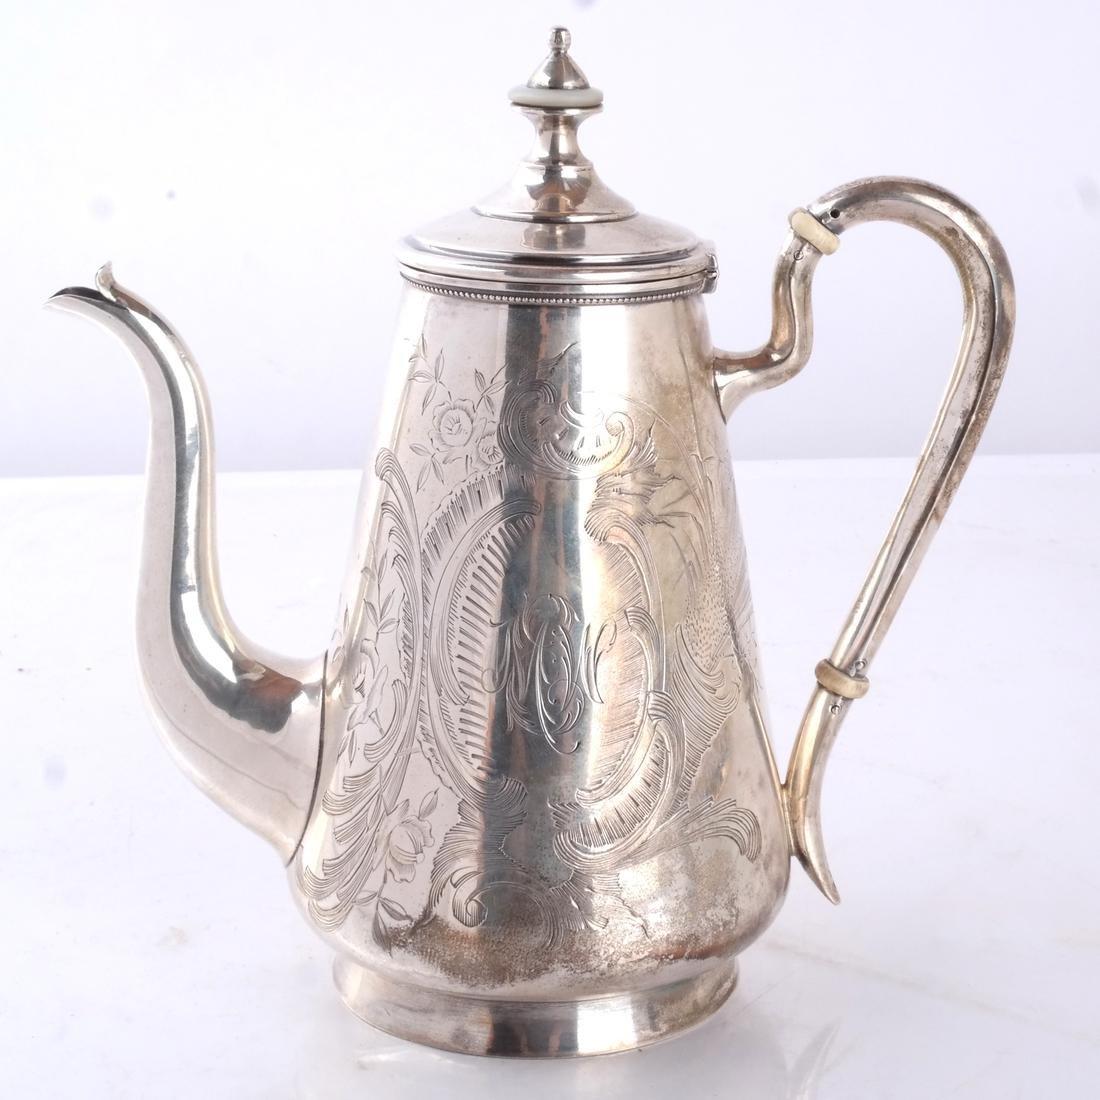 Russian Silver Teapot